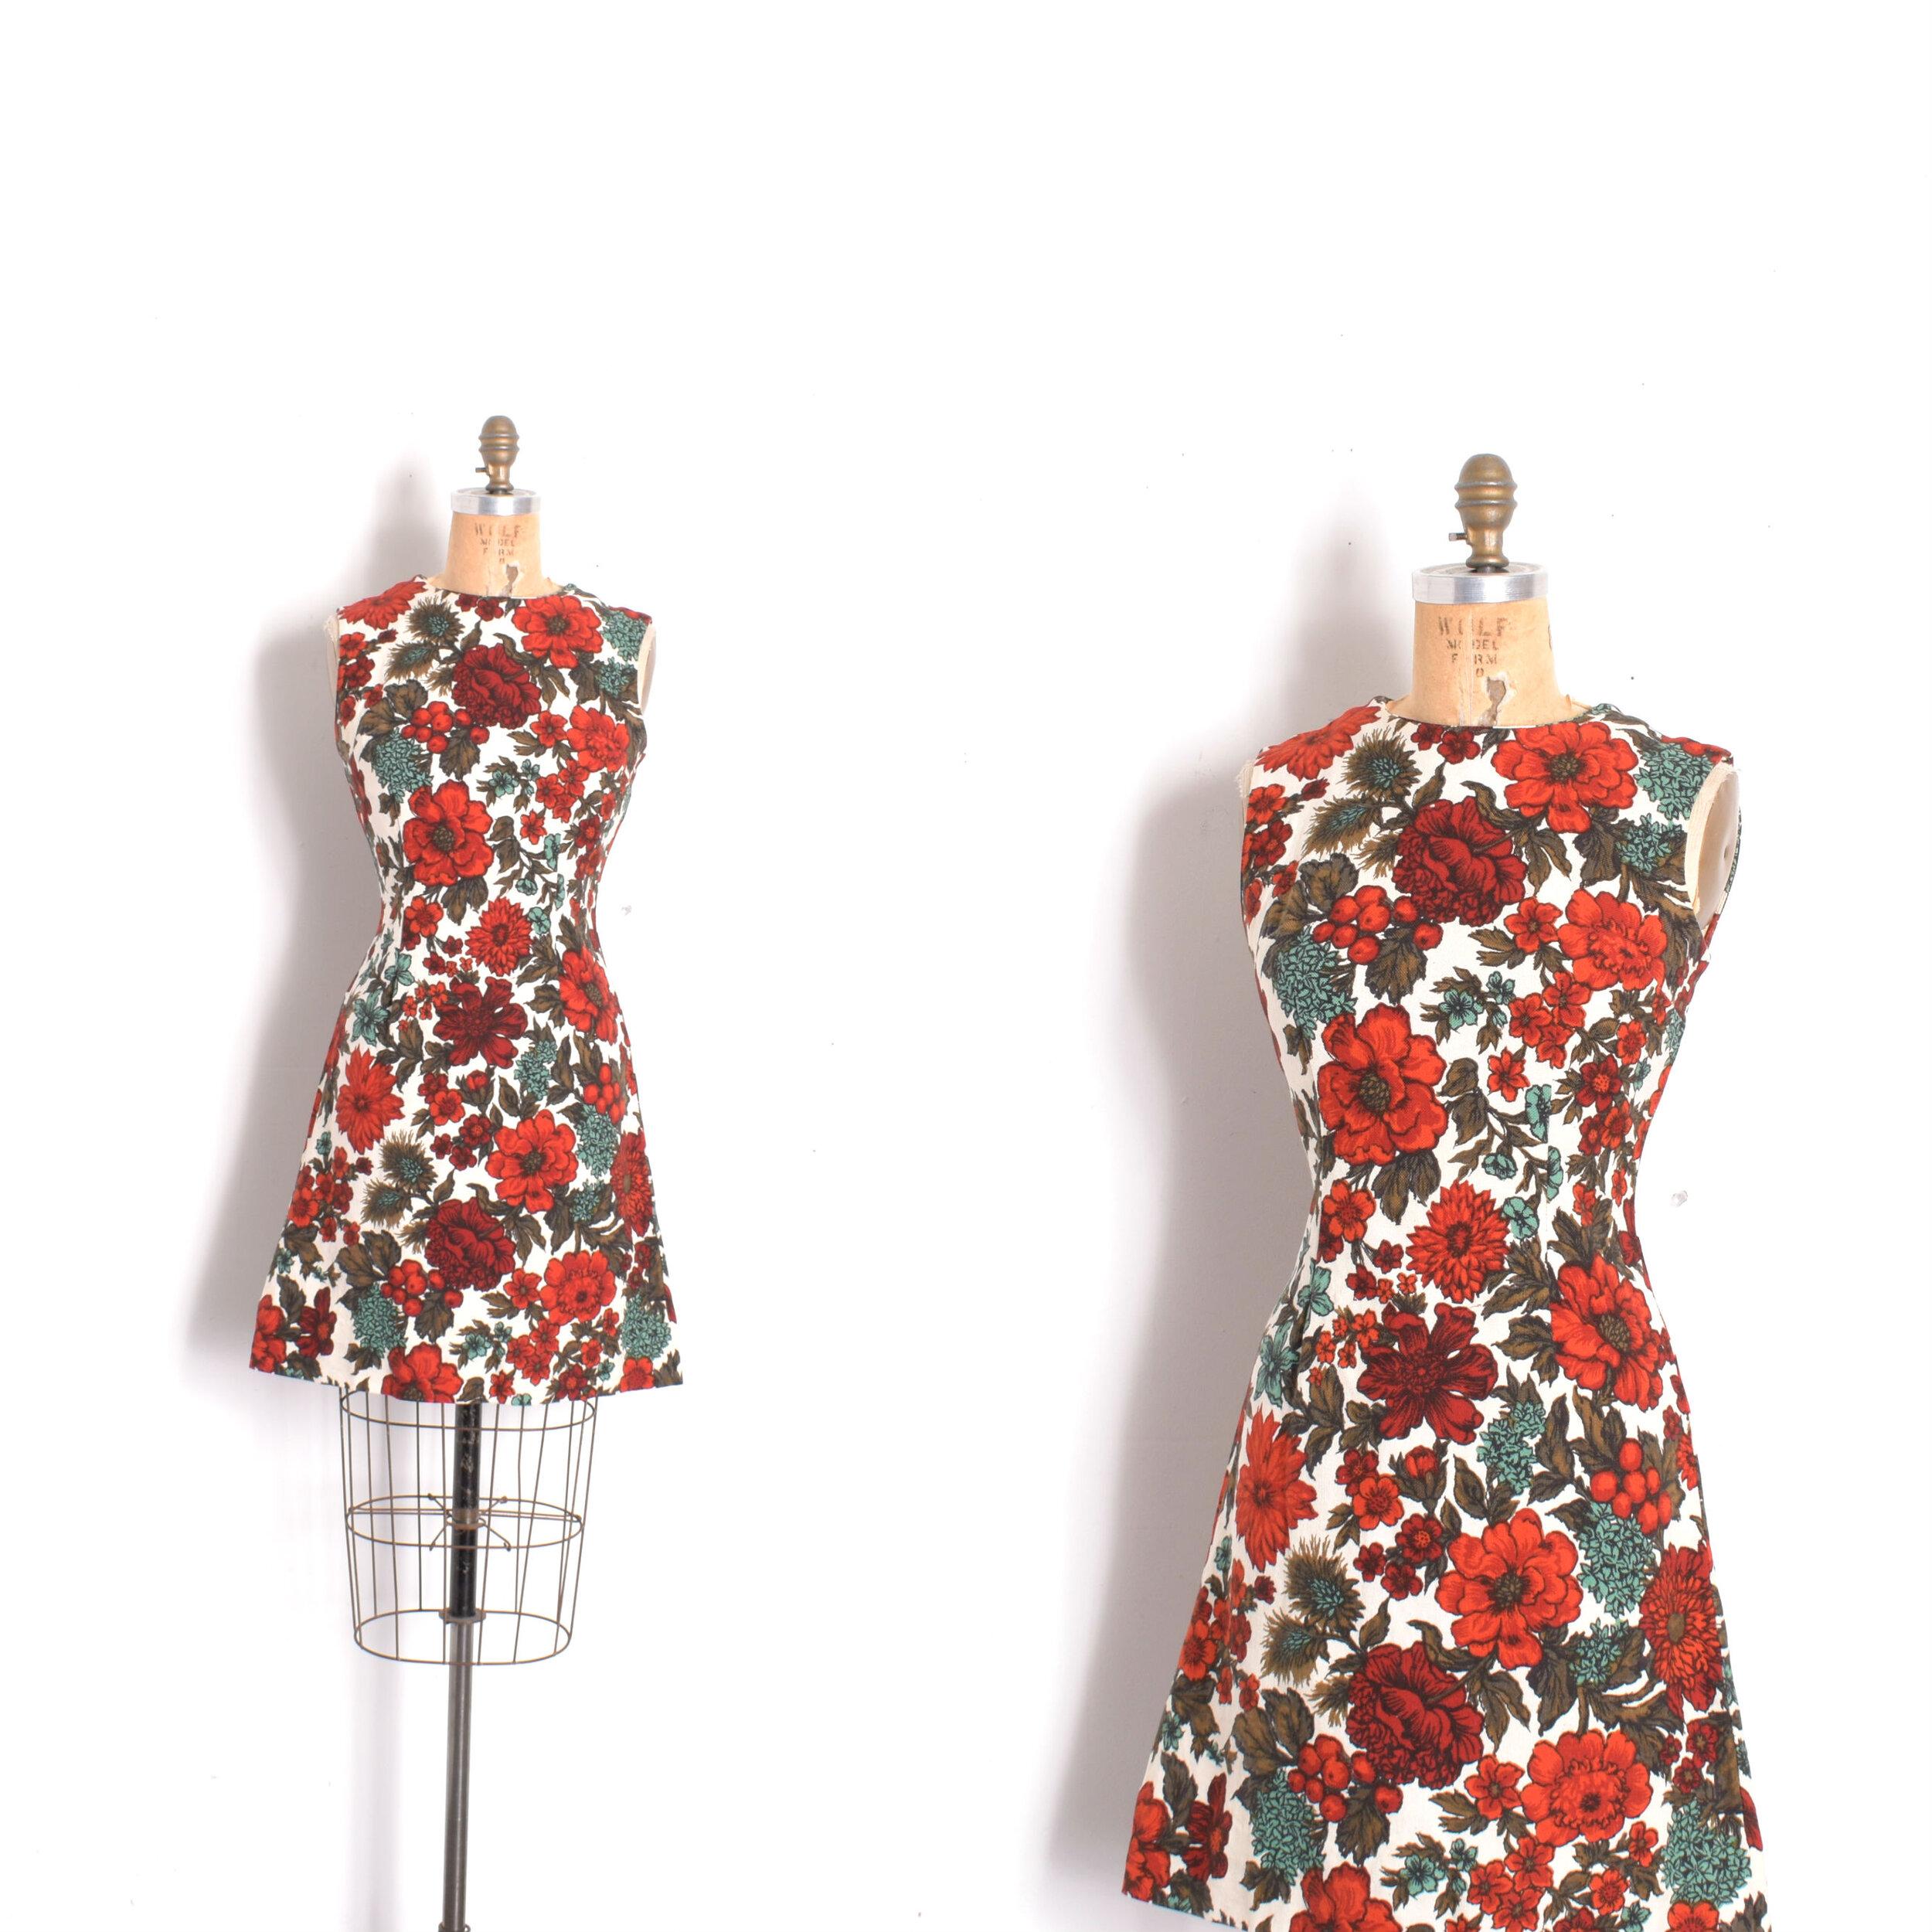 Vintage 1960s Print Mini Dress